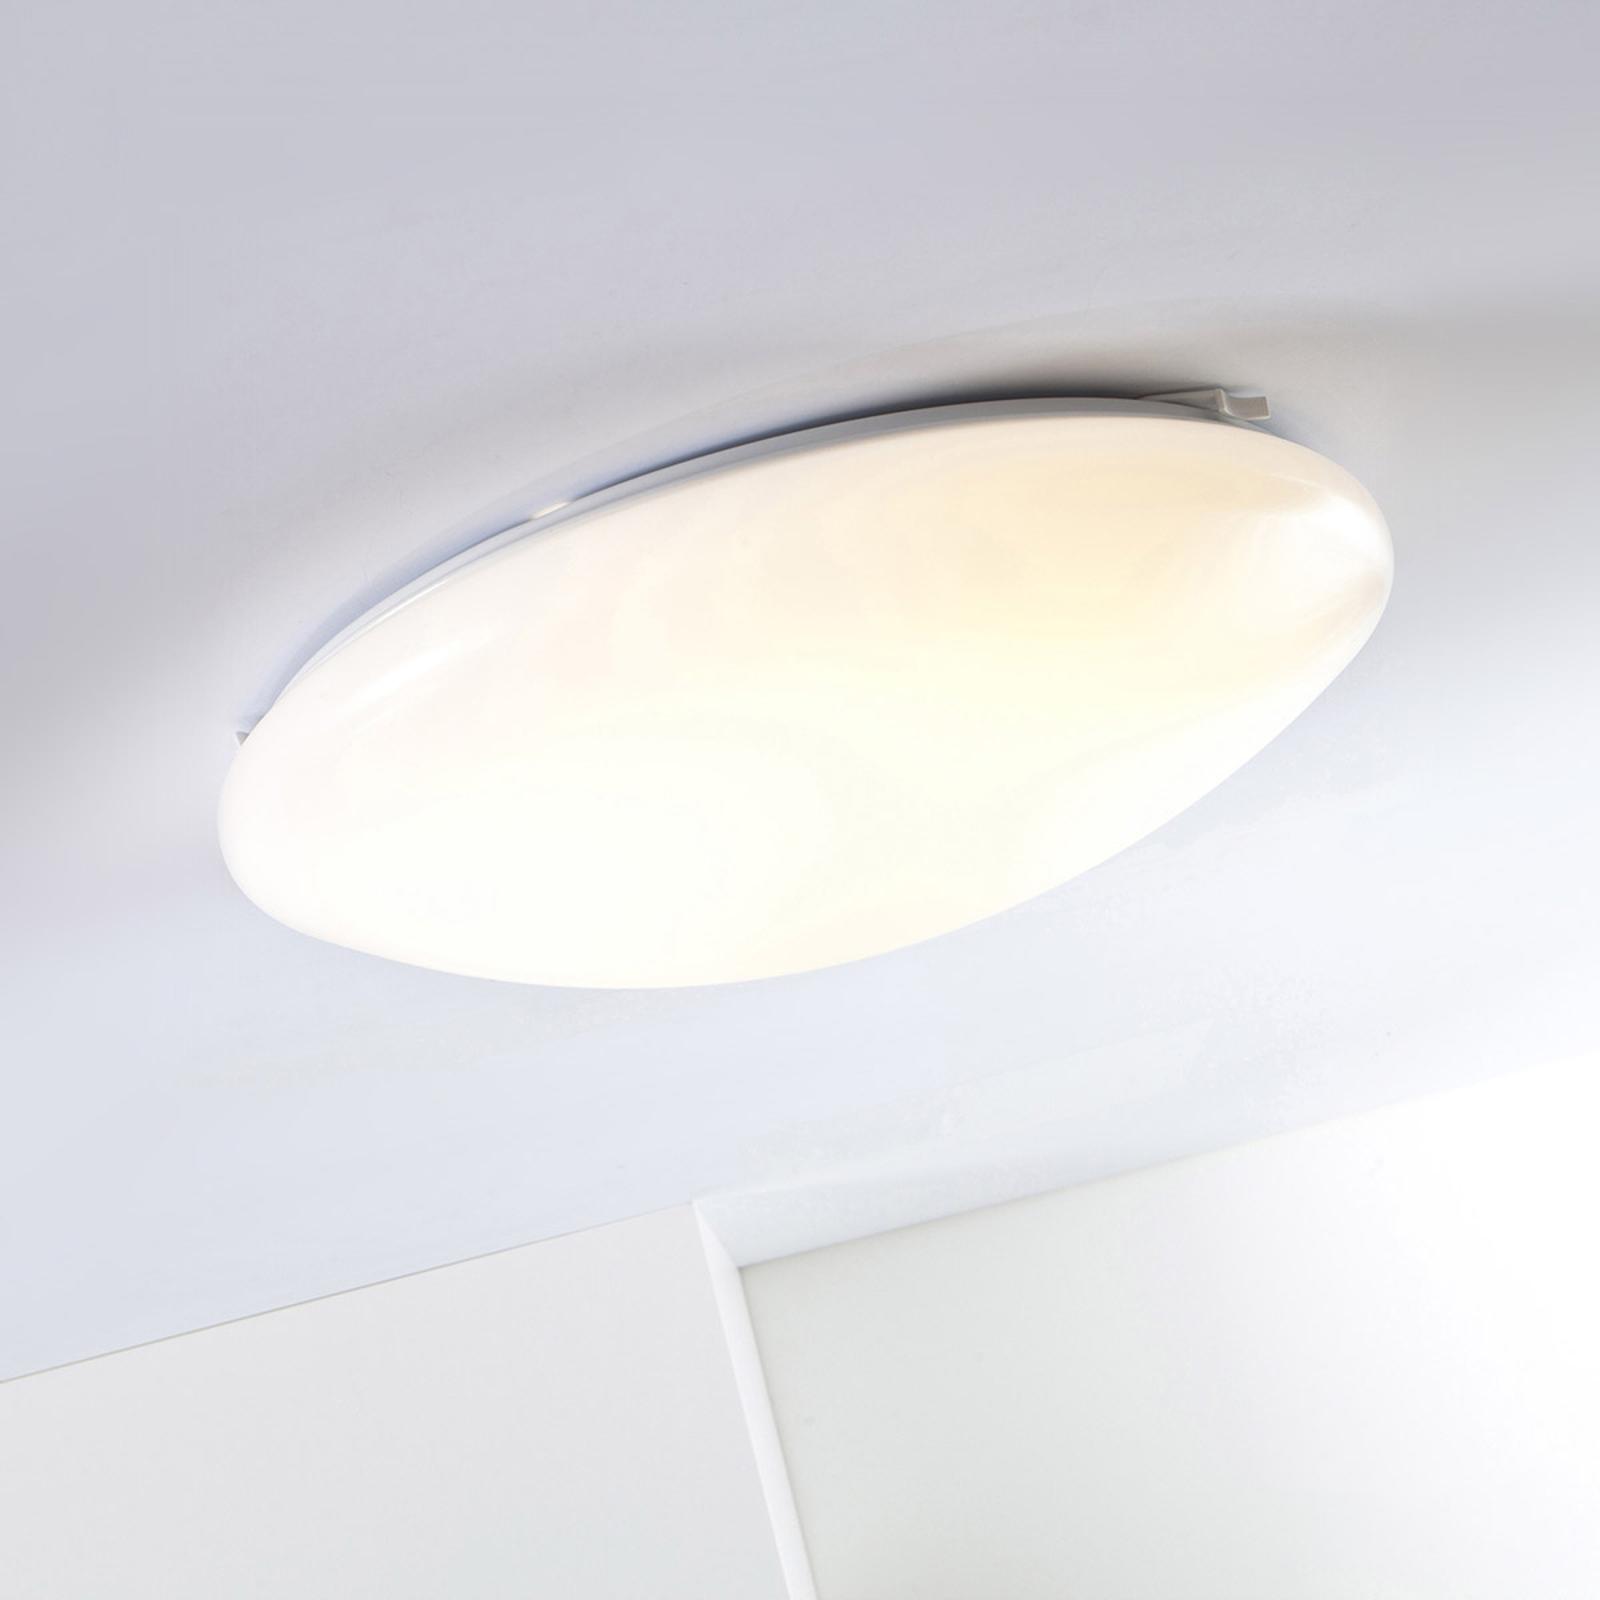 LED Basic - okrągła lampa sufitowa marki AEG, 14 W